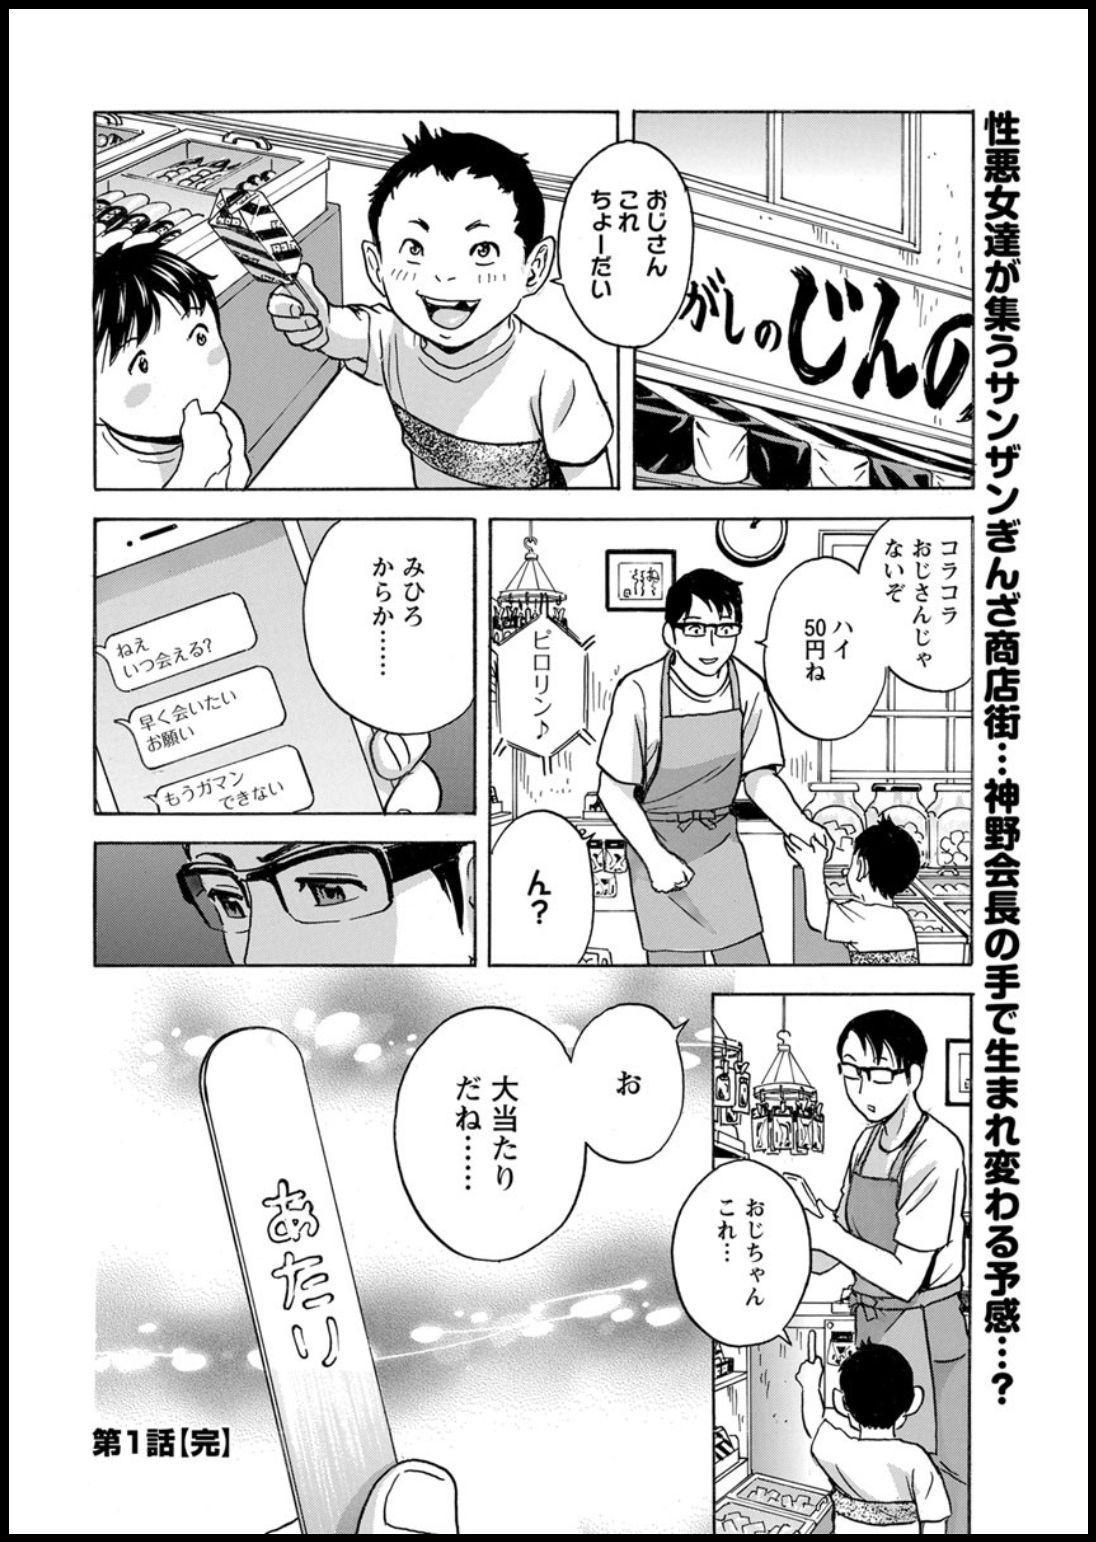 [Hidemaru] Yurase Bikyonyuu! Hataraku J-Cup Ch. 1-5 [Digital] 19